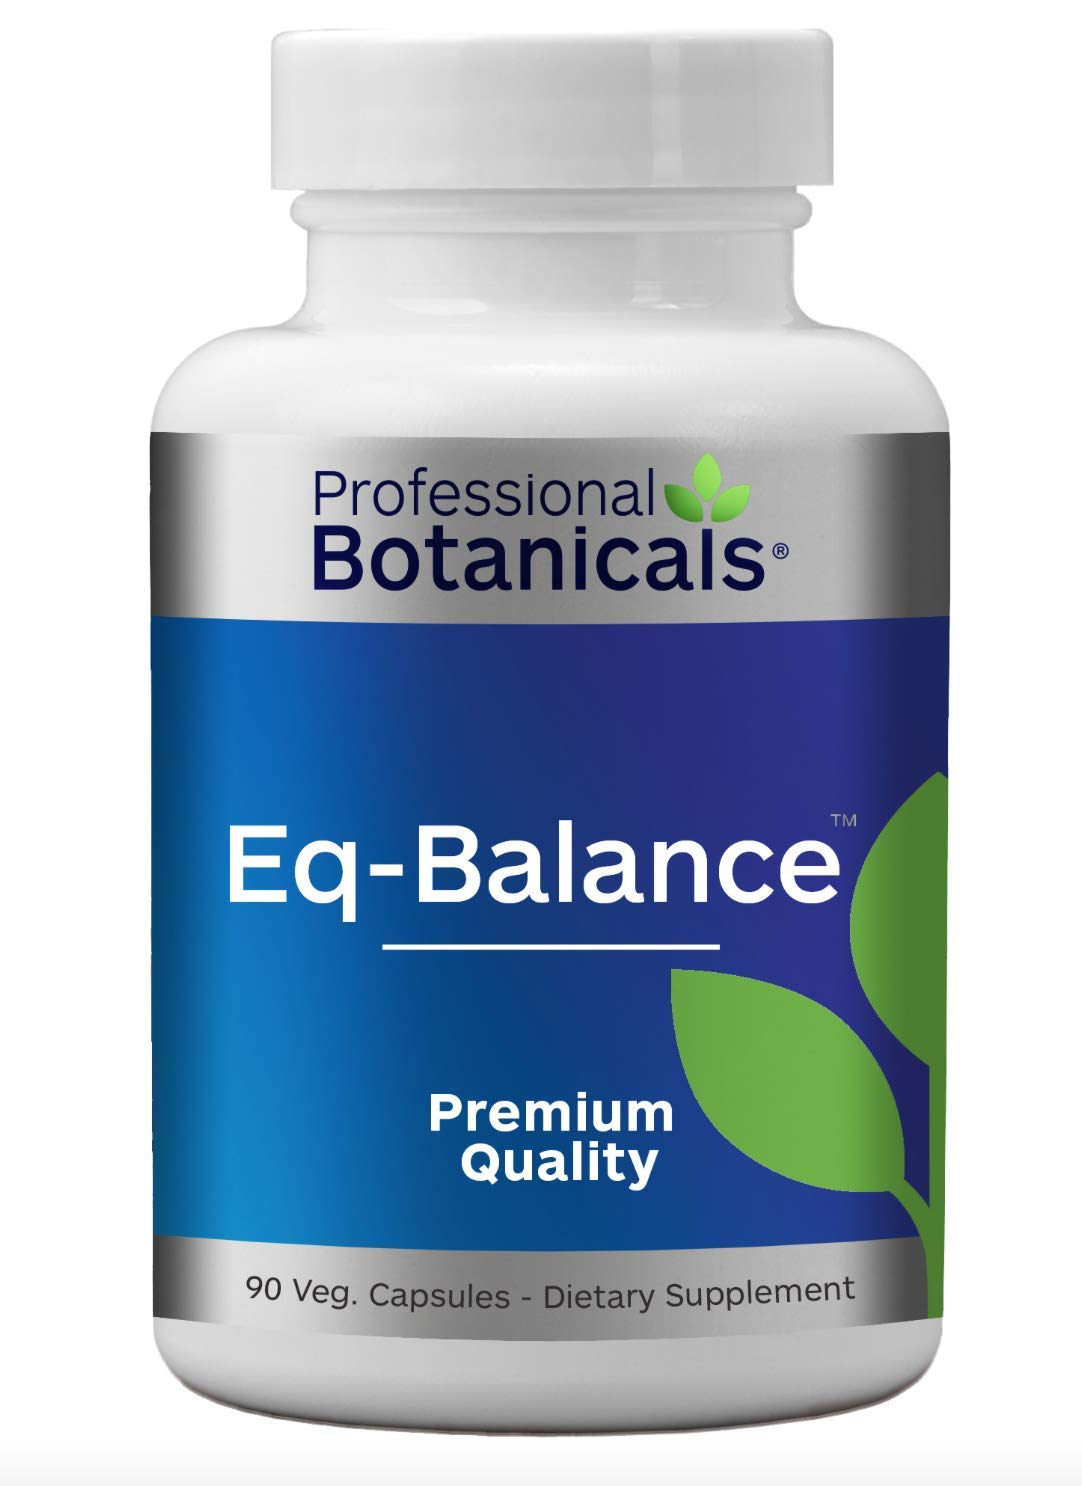 Professional Botanicals Eq-Balance, Natural Herbal Vegan Vertigo Motion Sickness Nausea Relief - 90 Veg Capsules by Professional Botanicals